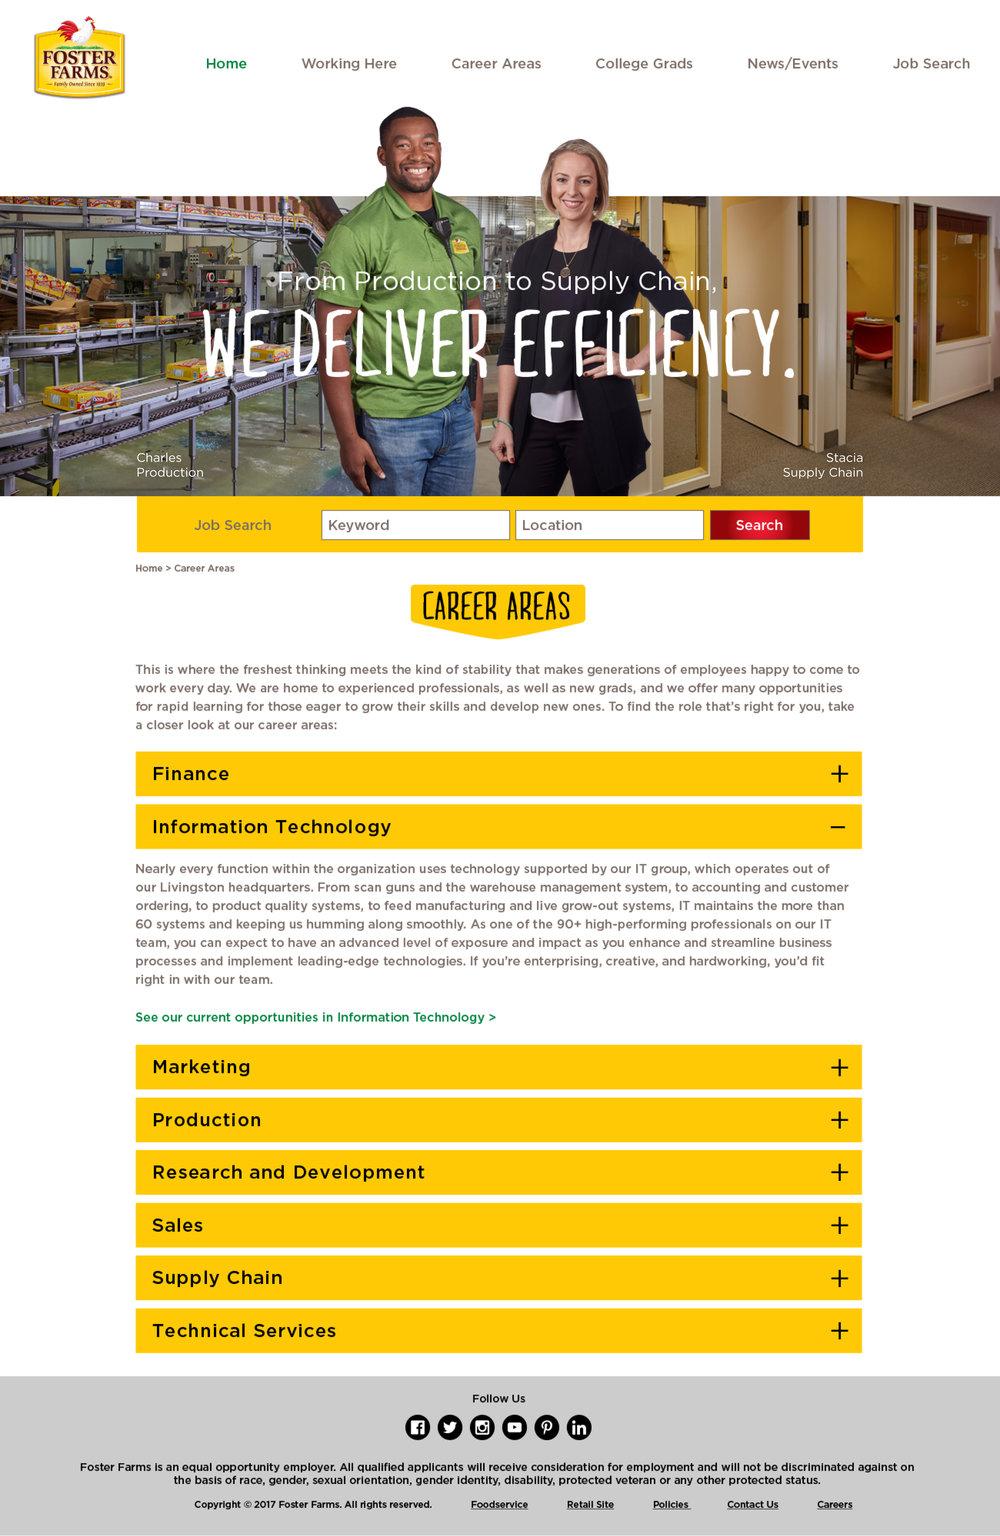 Foster Farms Responsive Website Design for Career Areas